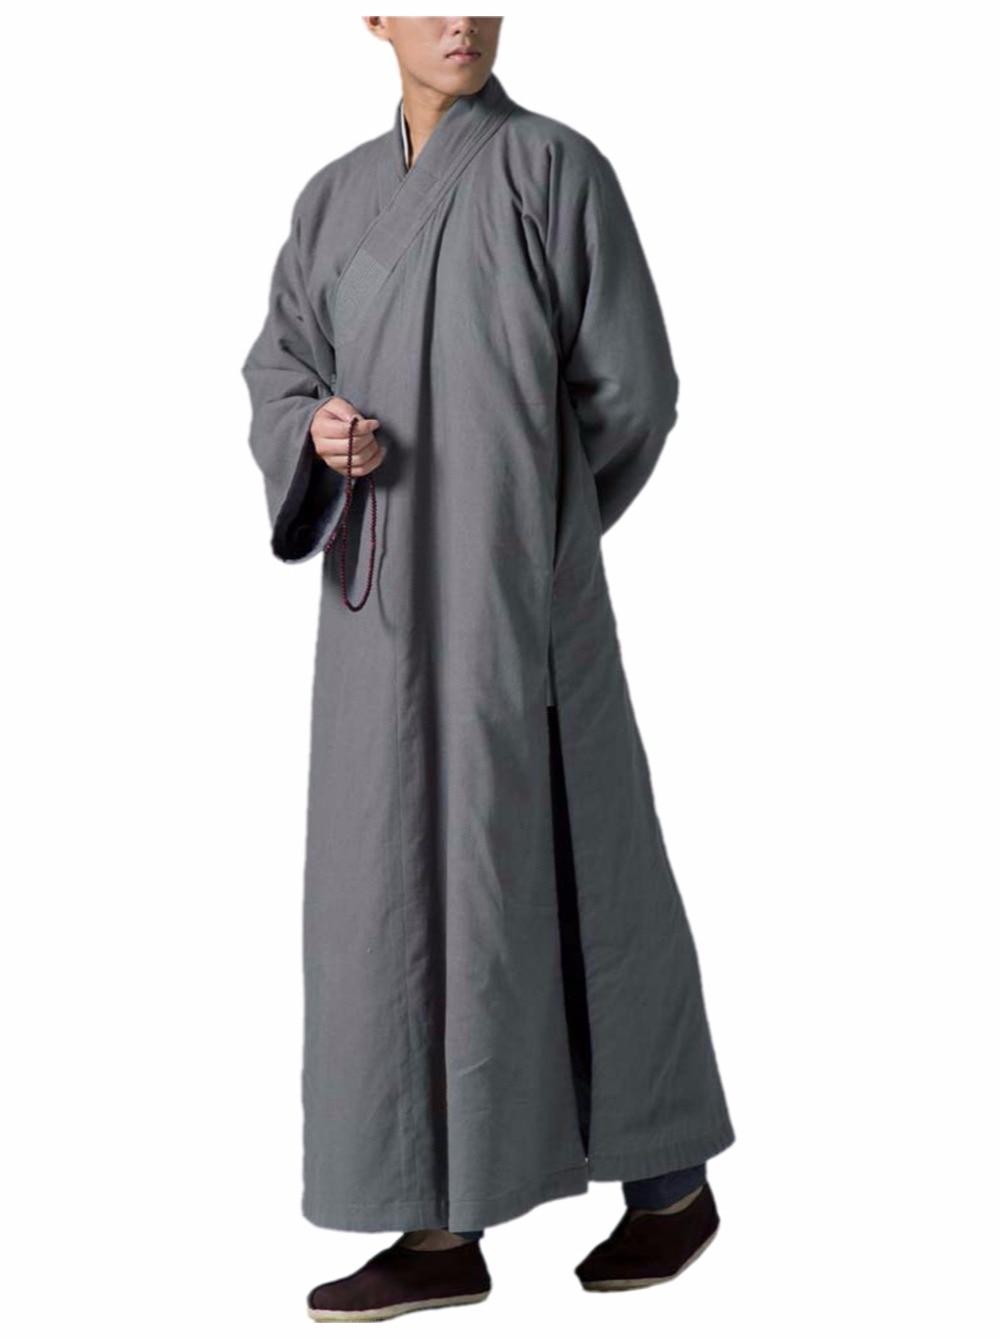 ZanYing budistična meditacija po meri odebeljen bombažni ogrinjač - Nacionalni oblačila